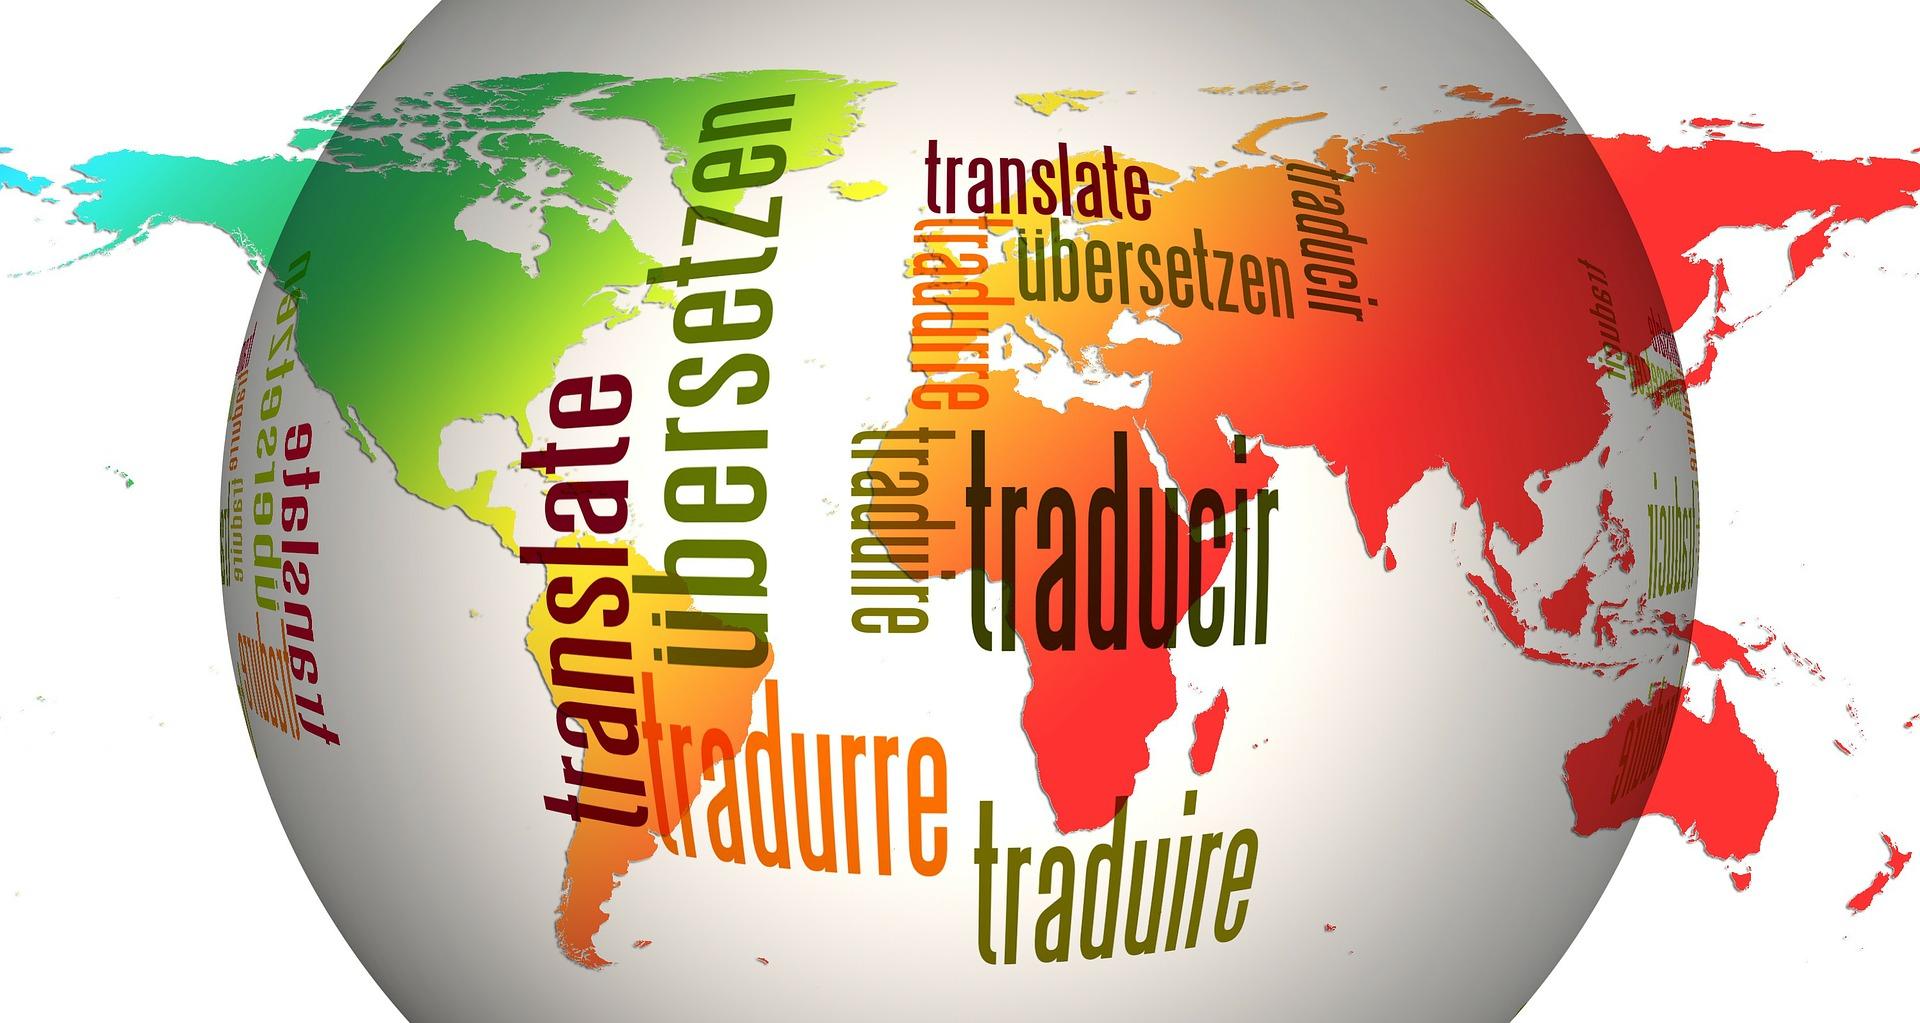 Langauge Service, Corporate Spanish, Translation Services